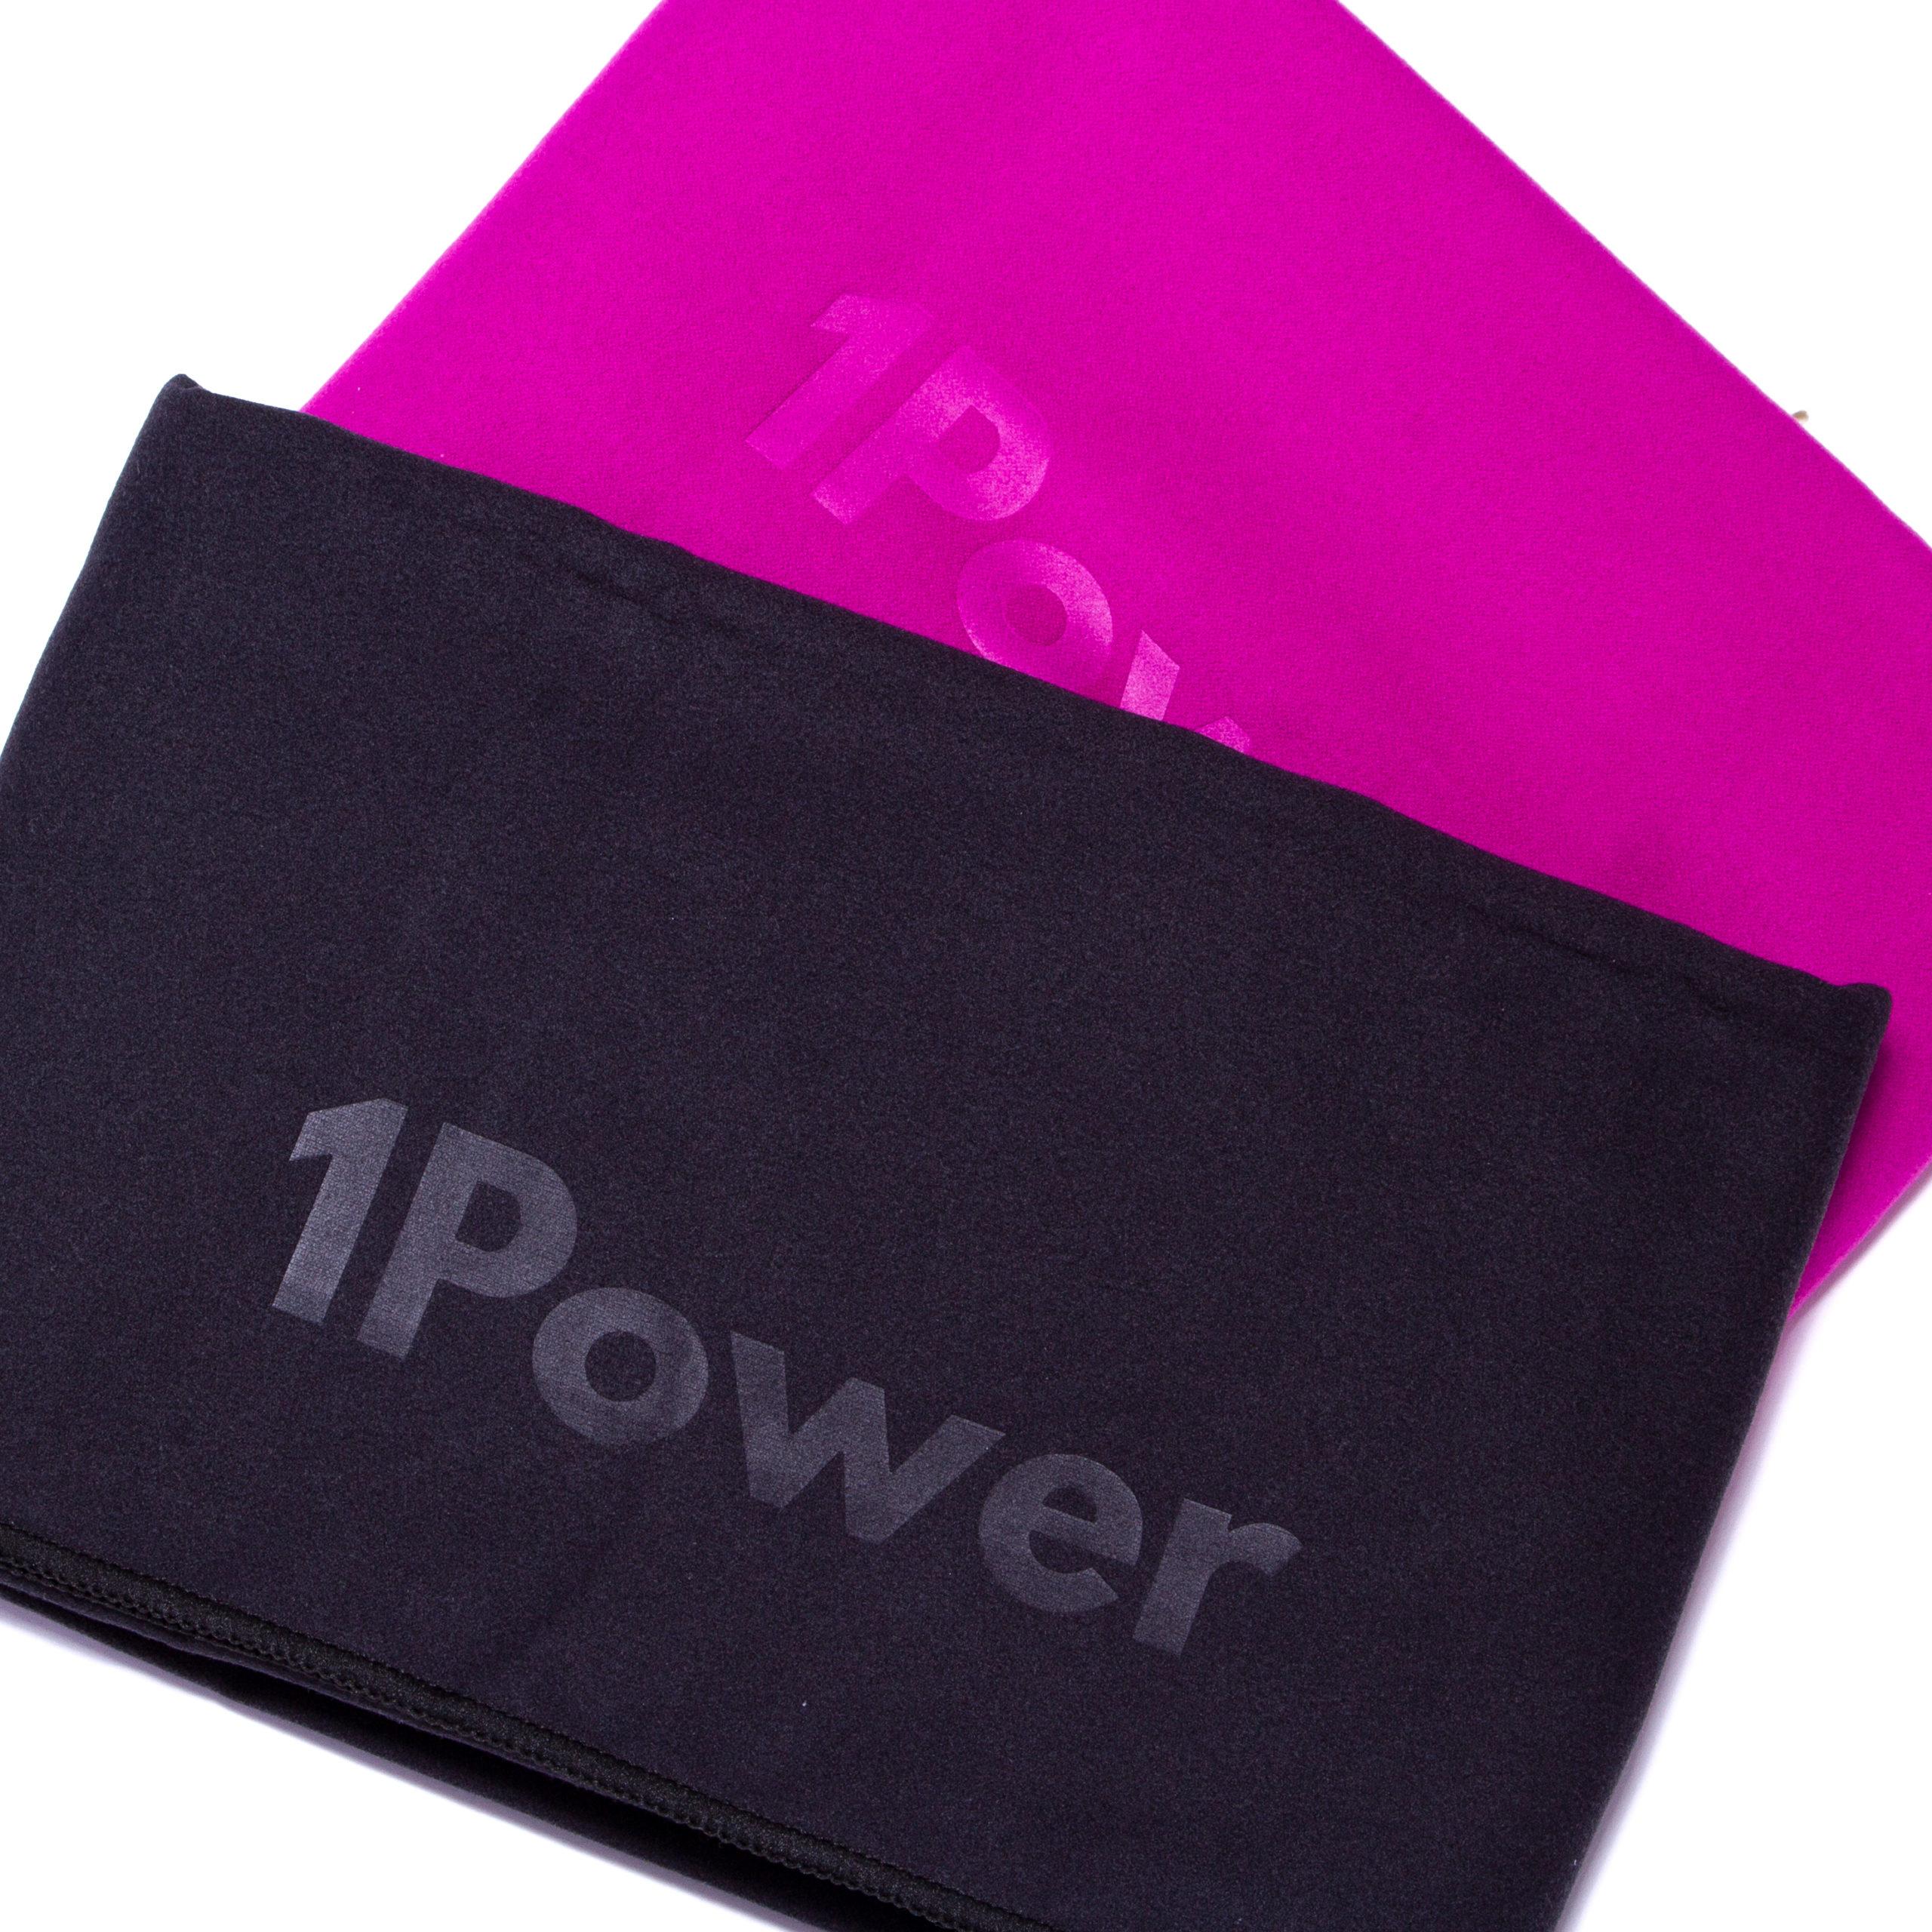 1power-17